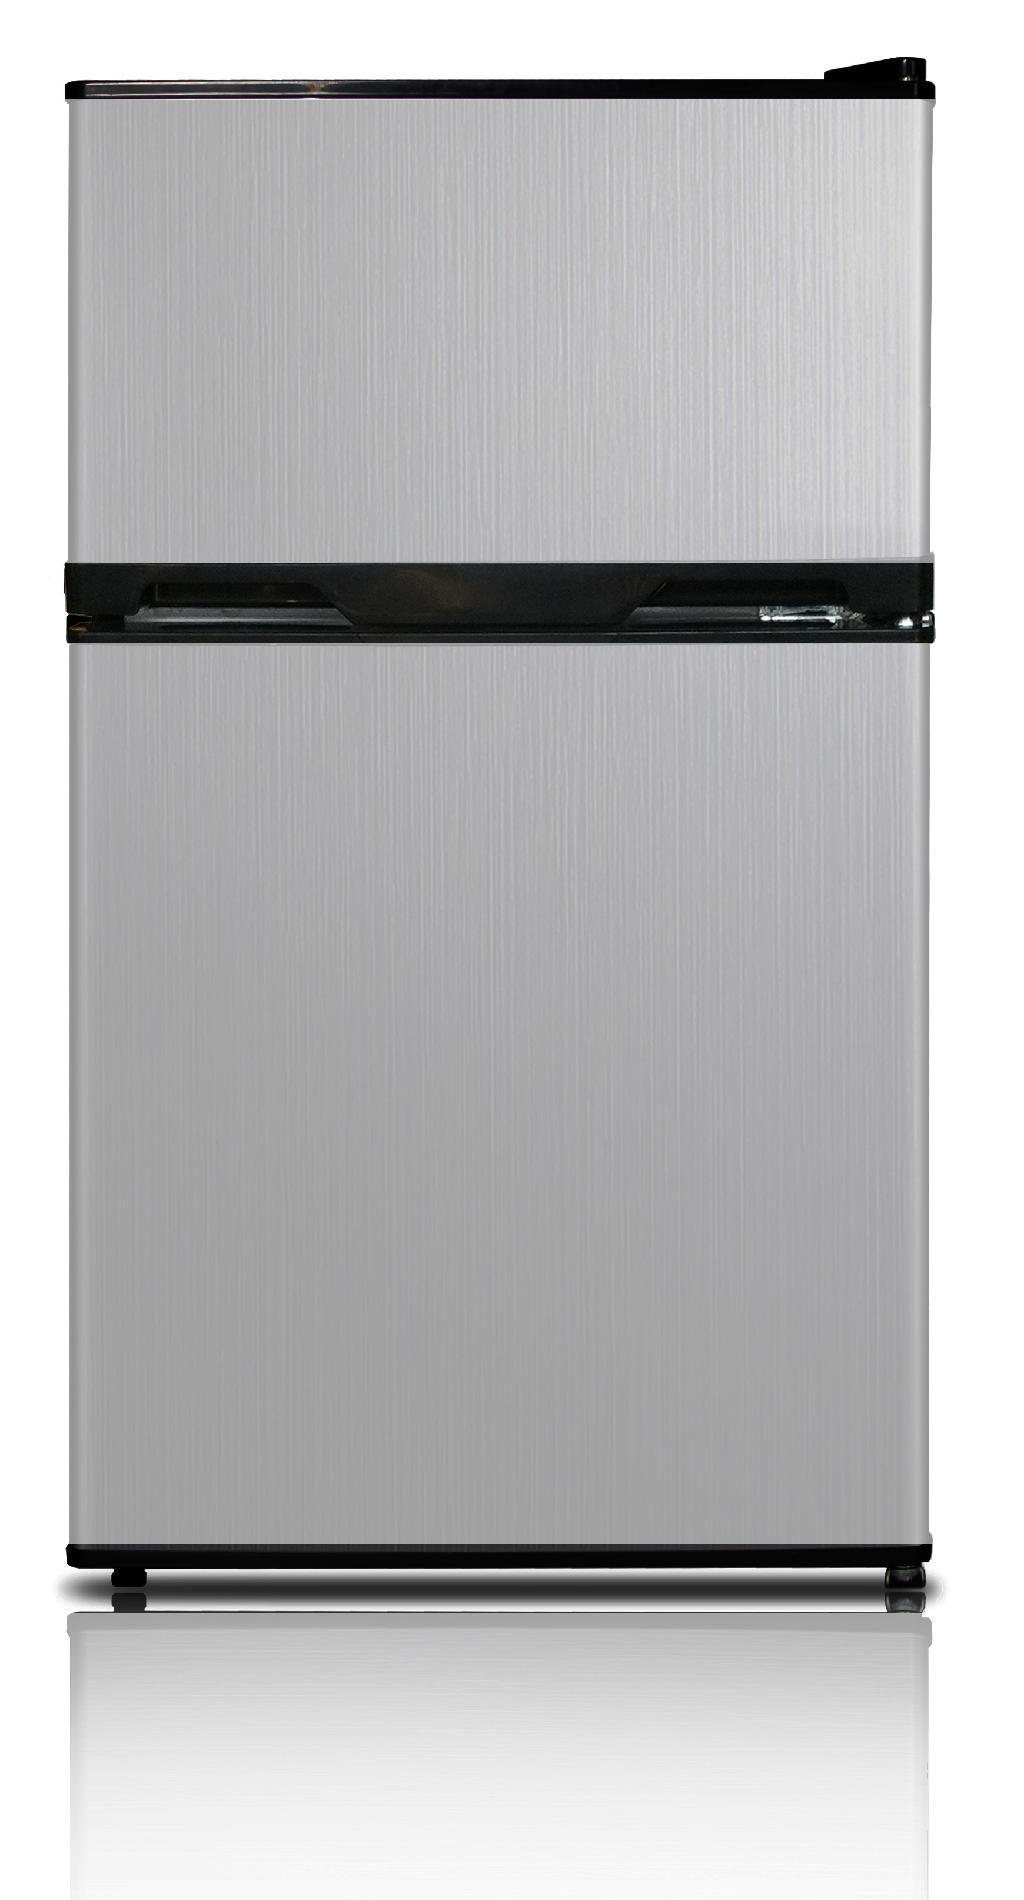 Kenmore 3.1 cu ft. 2-Door Compact Refrigerator, Stainless Steel ENERGY STAR® - Appliances - Refrigerators - Compact Refrigerators